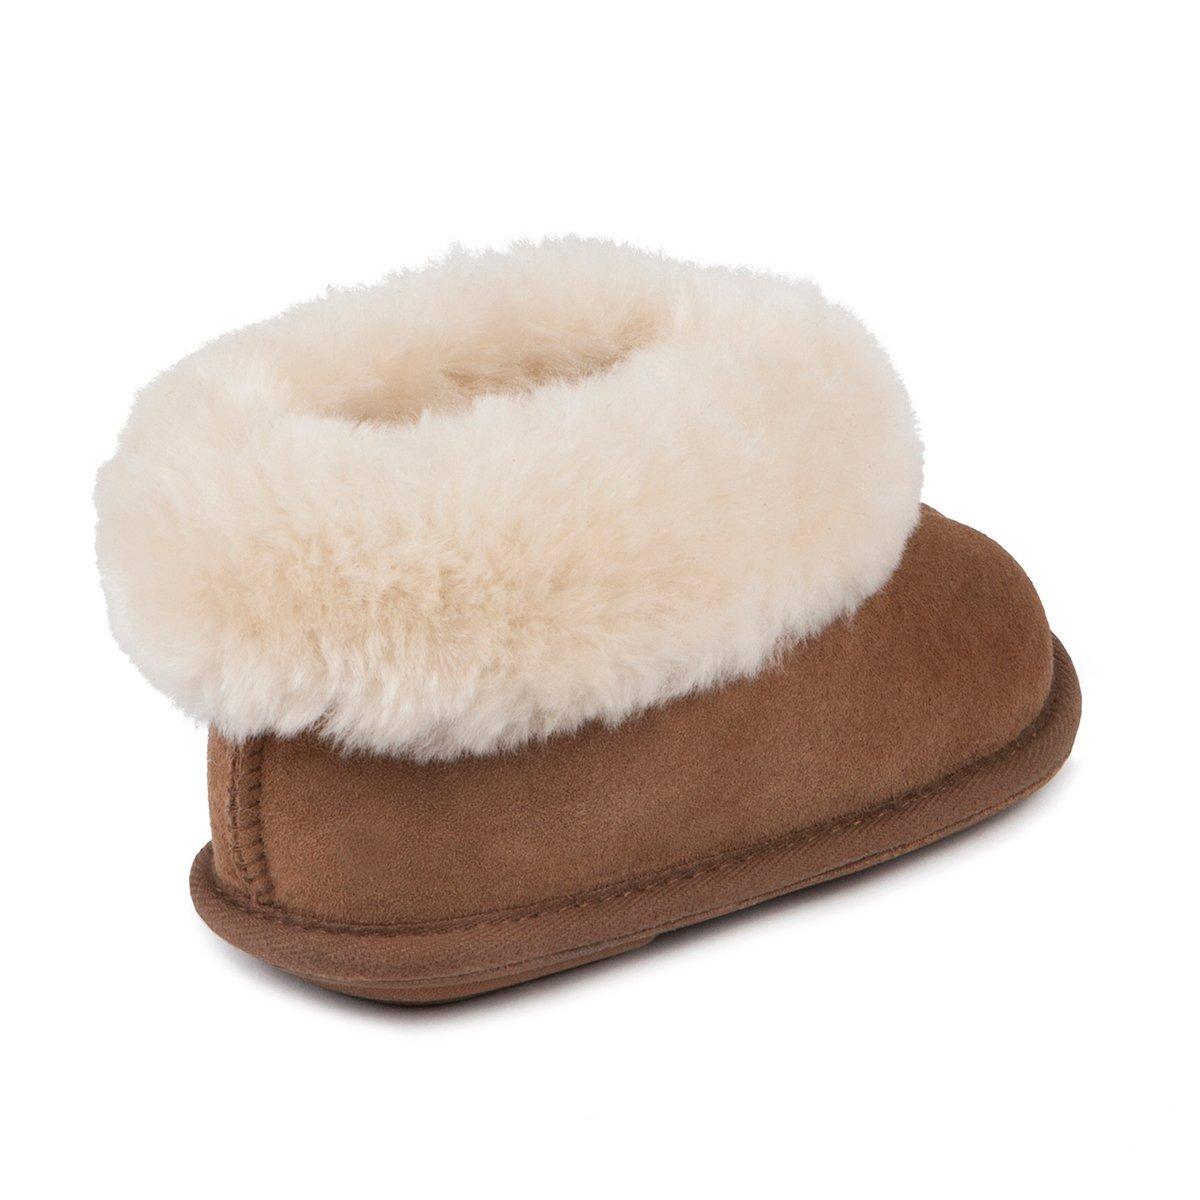 5f7abb938406 Just Sheepskin Childrens Classic Sheepskin Slippers  Amazon.co.uk  Shoes    Bags